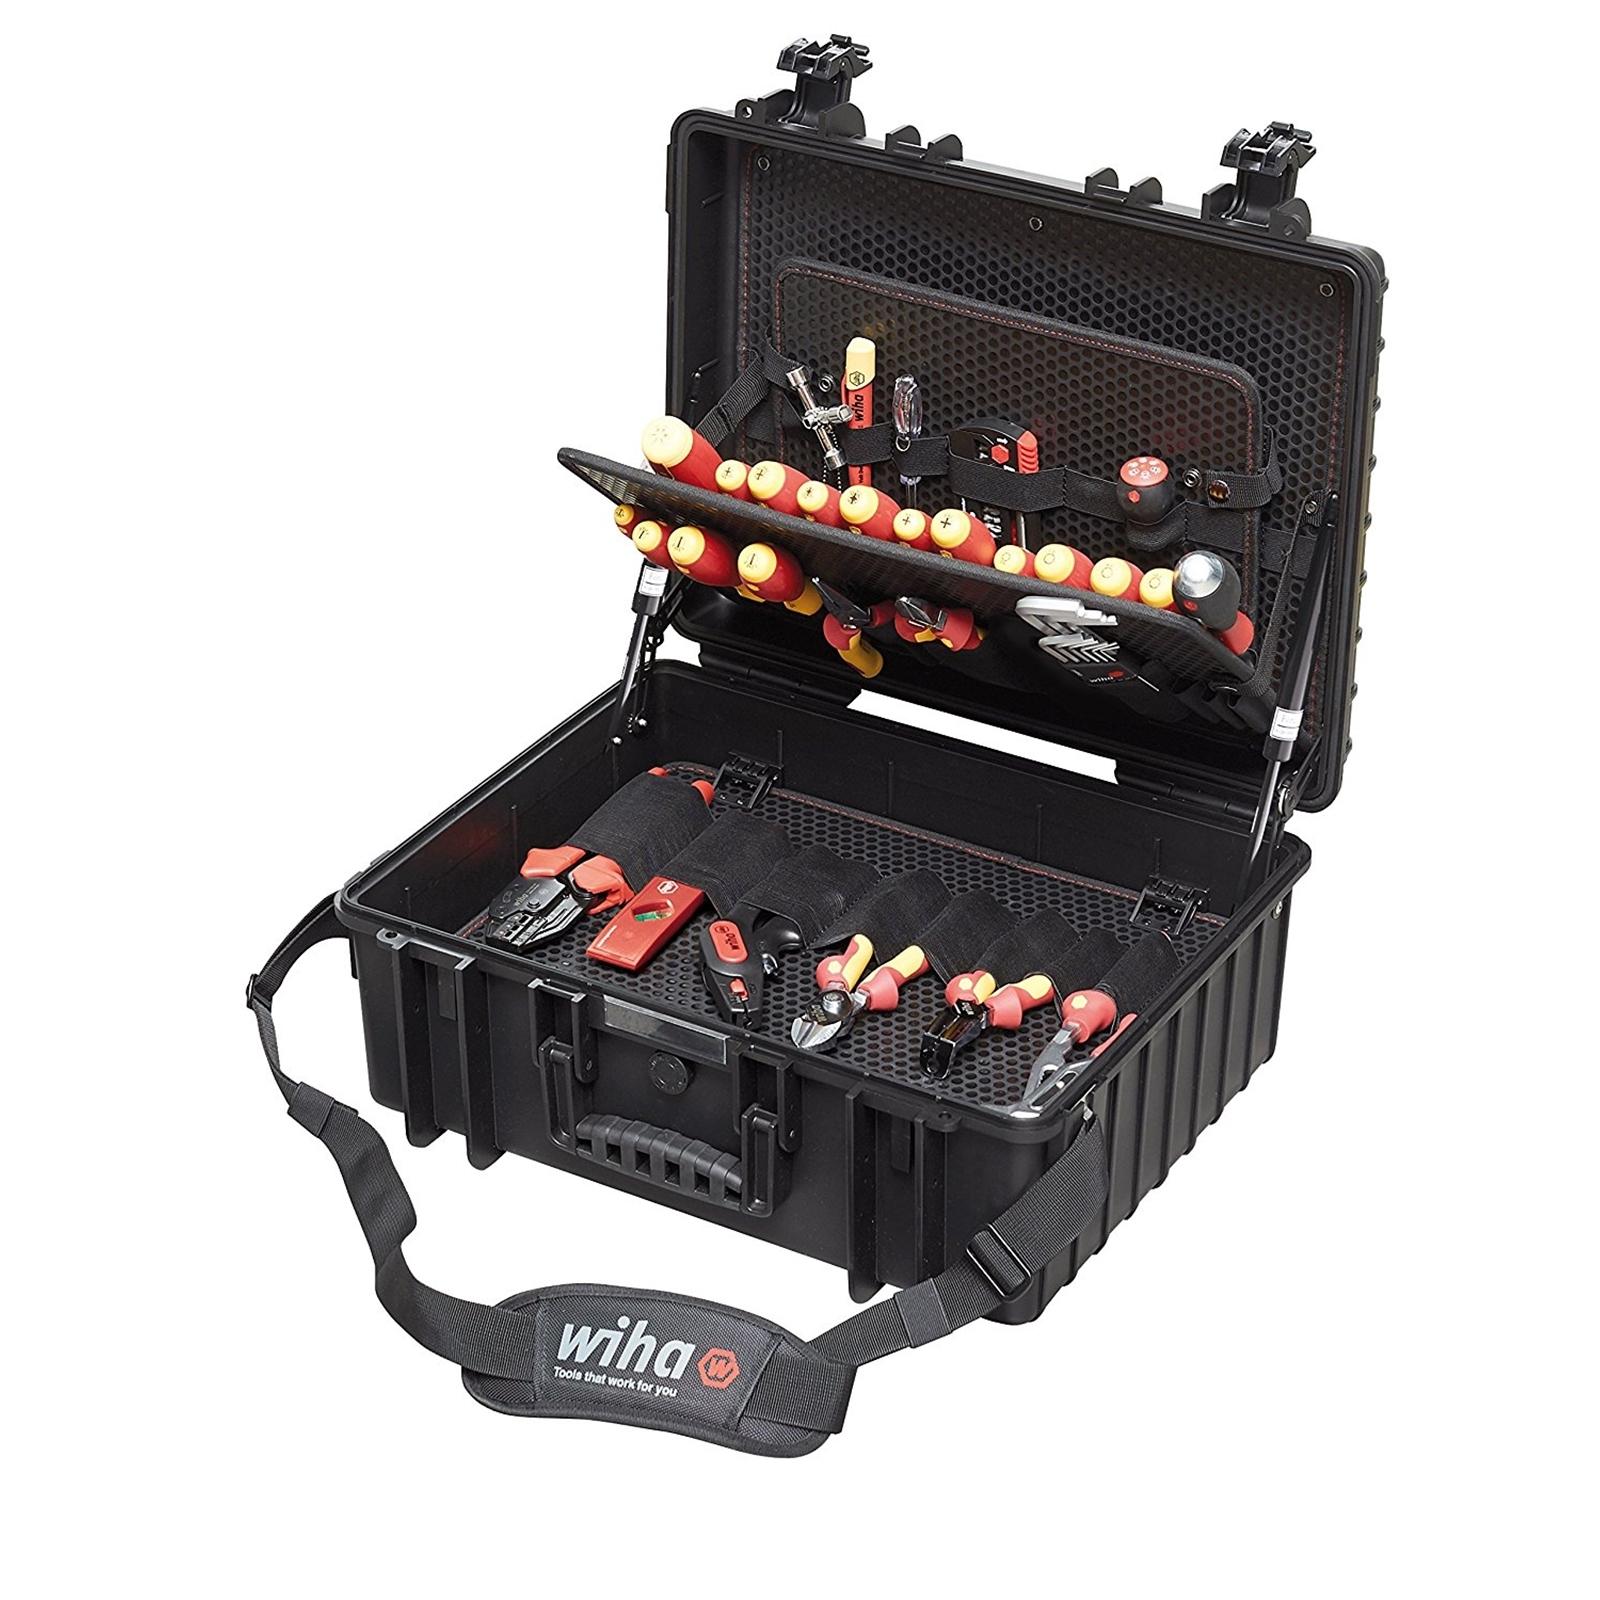 Wiha 80 Piece XL Deluxe Tool Case Kit